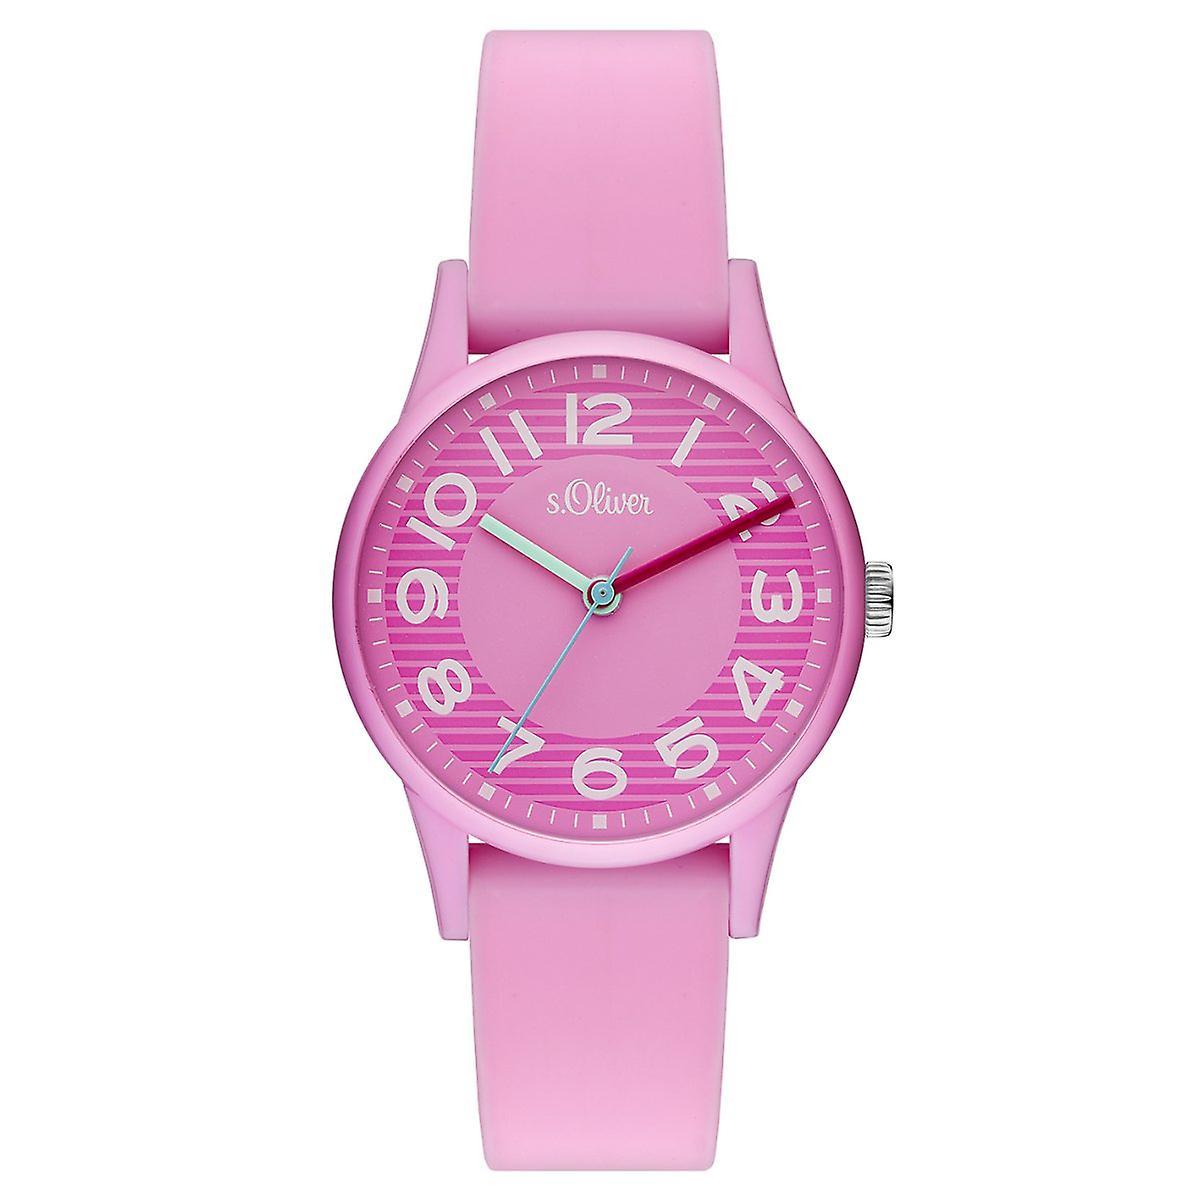 s.Oliver Uhr Kinder-Armbanduhr Kids Mädchen SO-3515-PQ